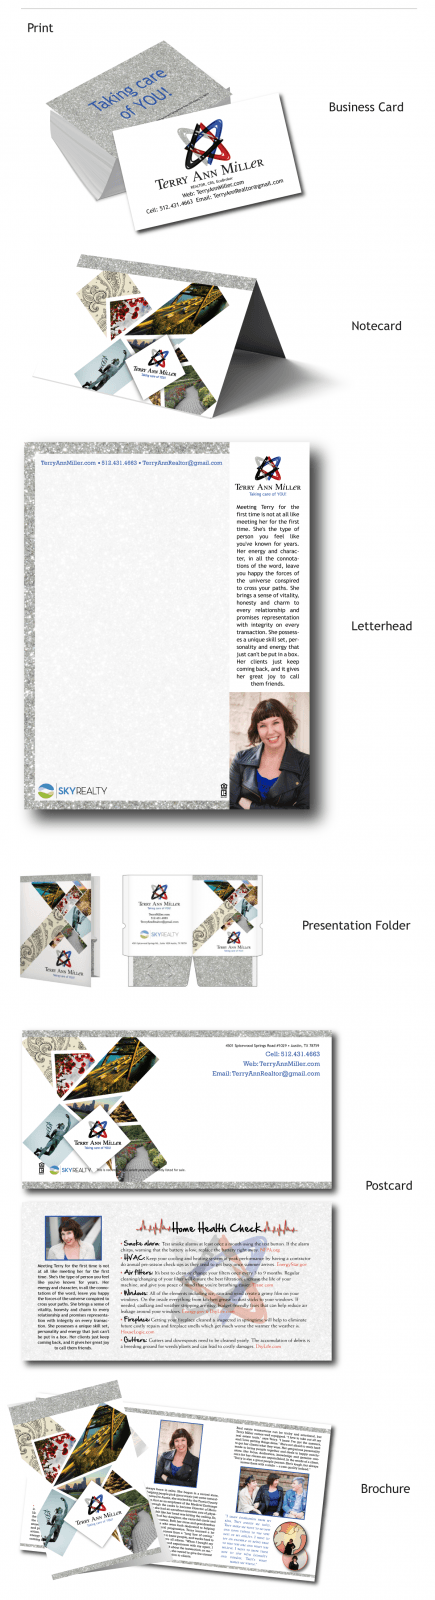 Design-Board-Web---Terry-Ann-Miller_05